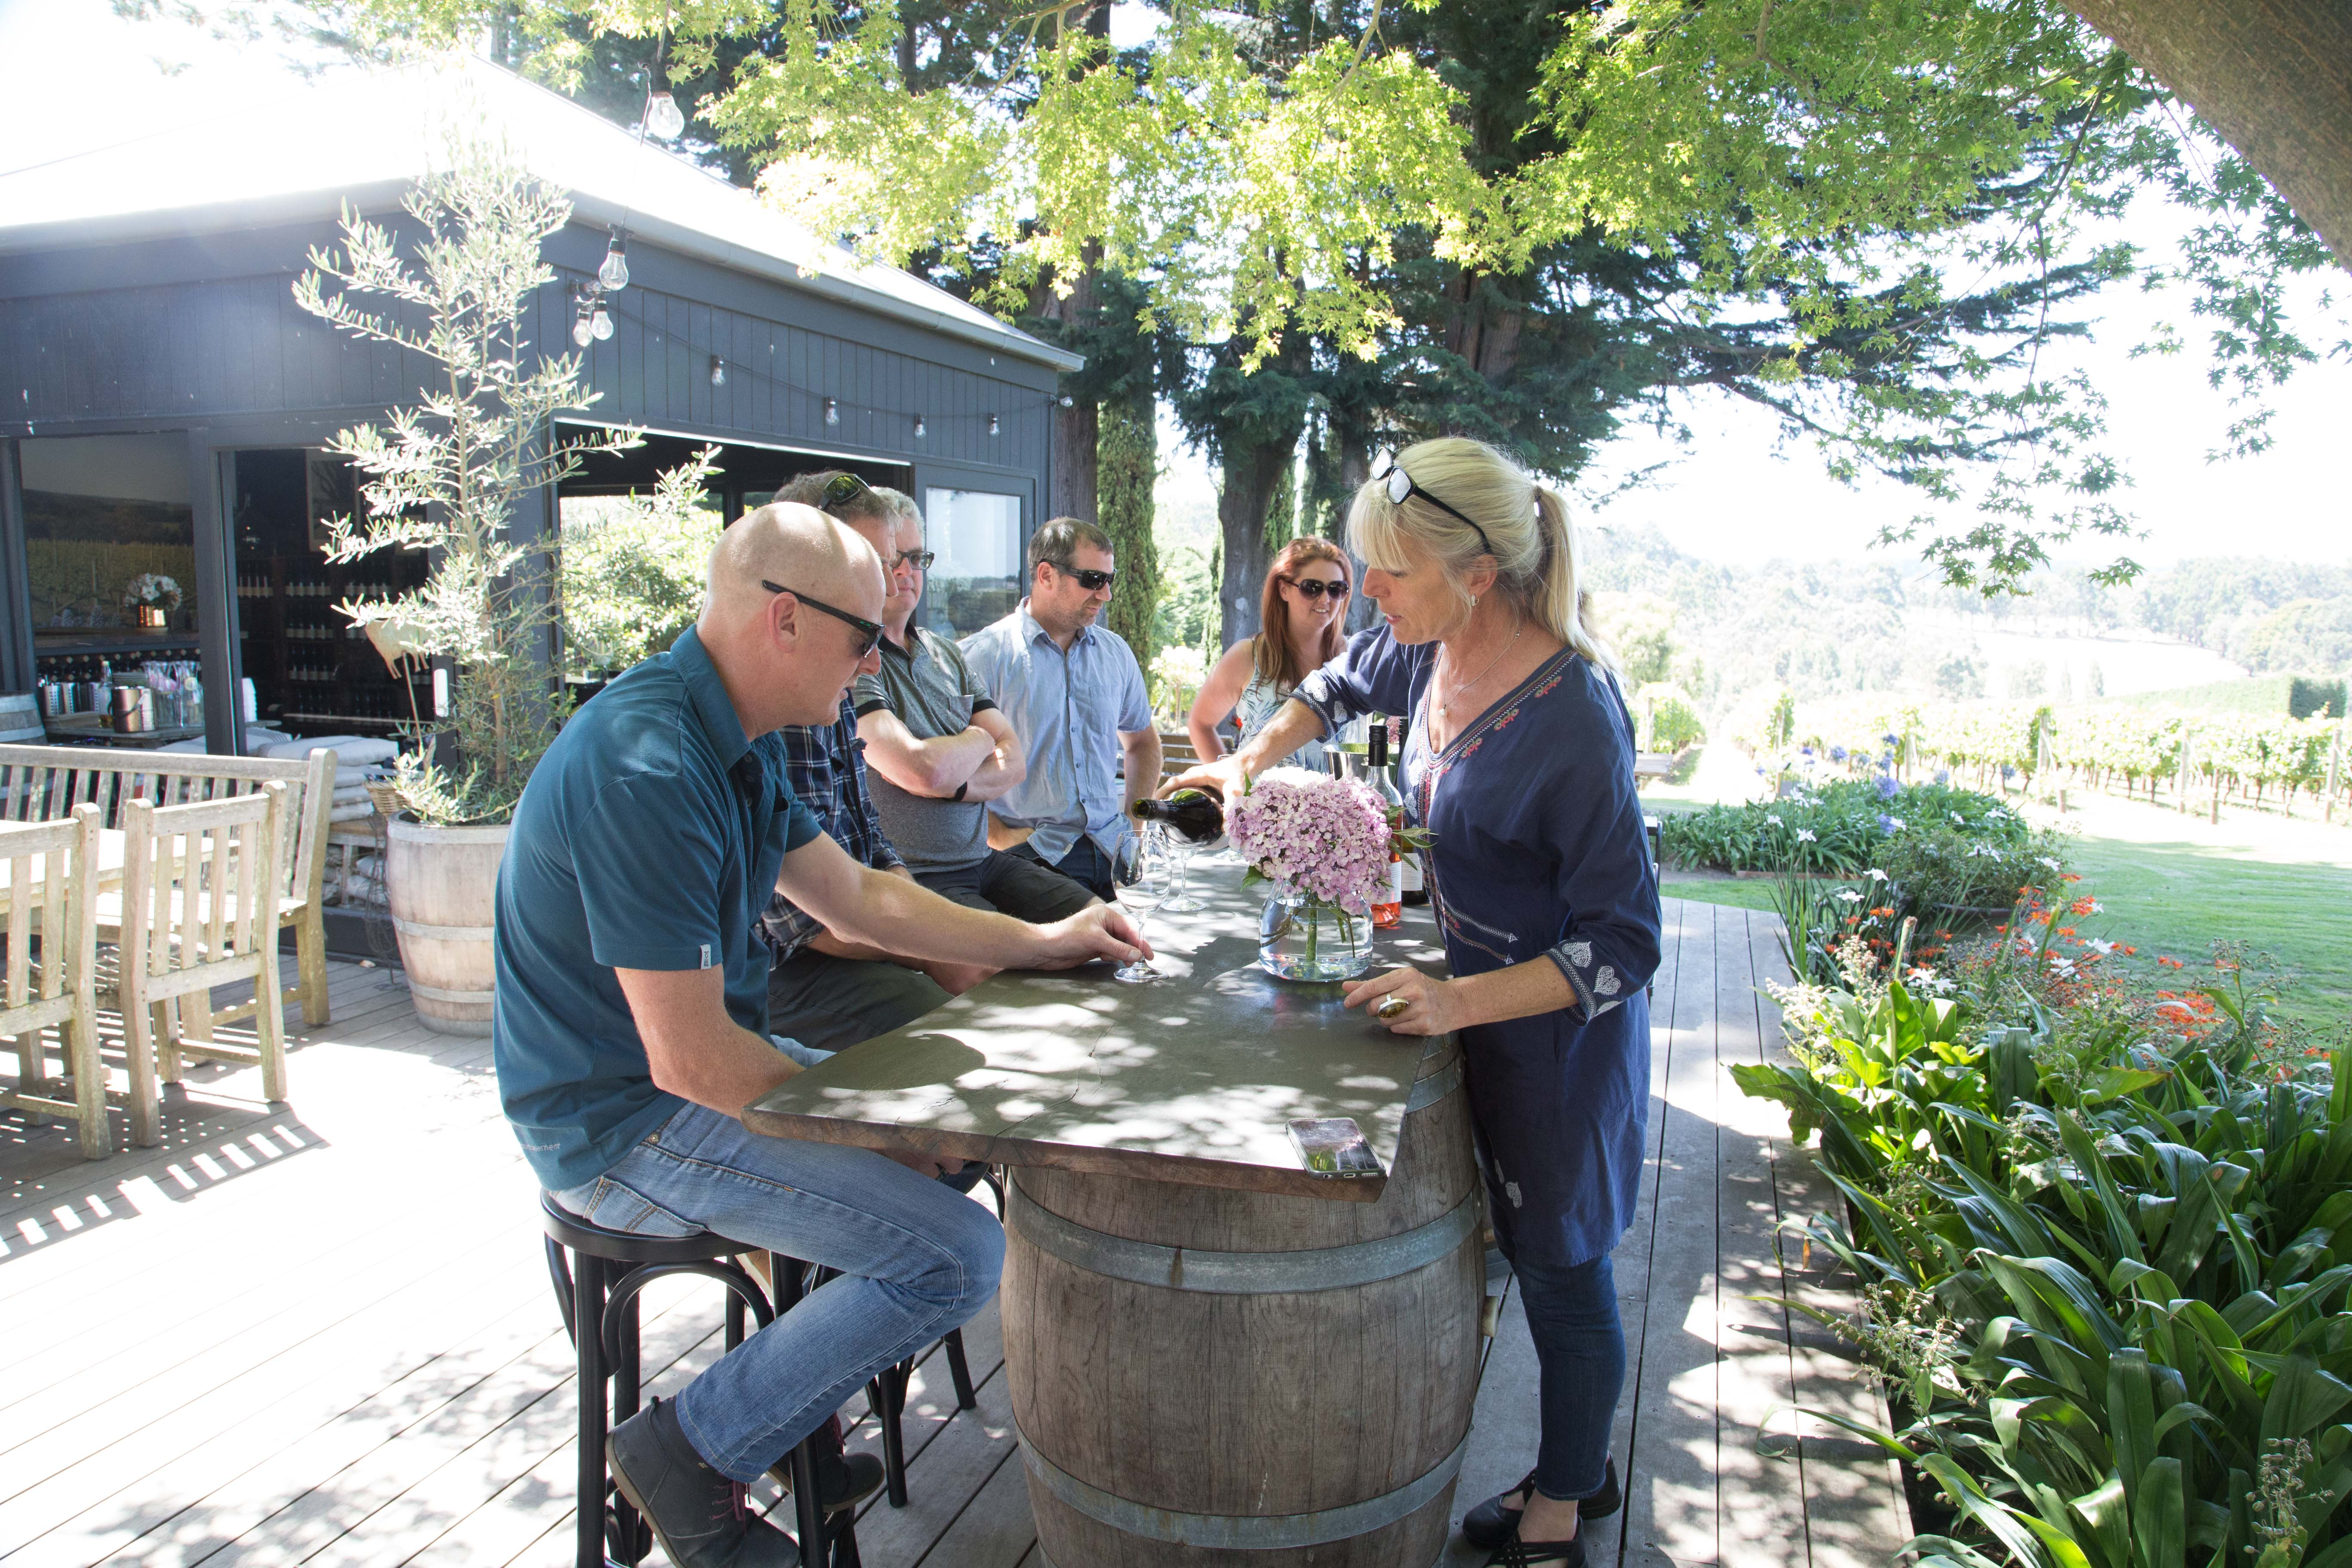 wine tasting at Panton Vineyard, Shoreham, Mornington Peninsula